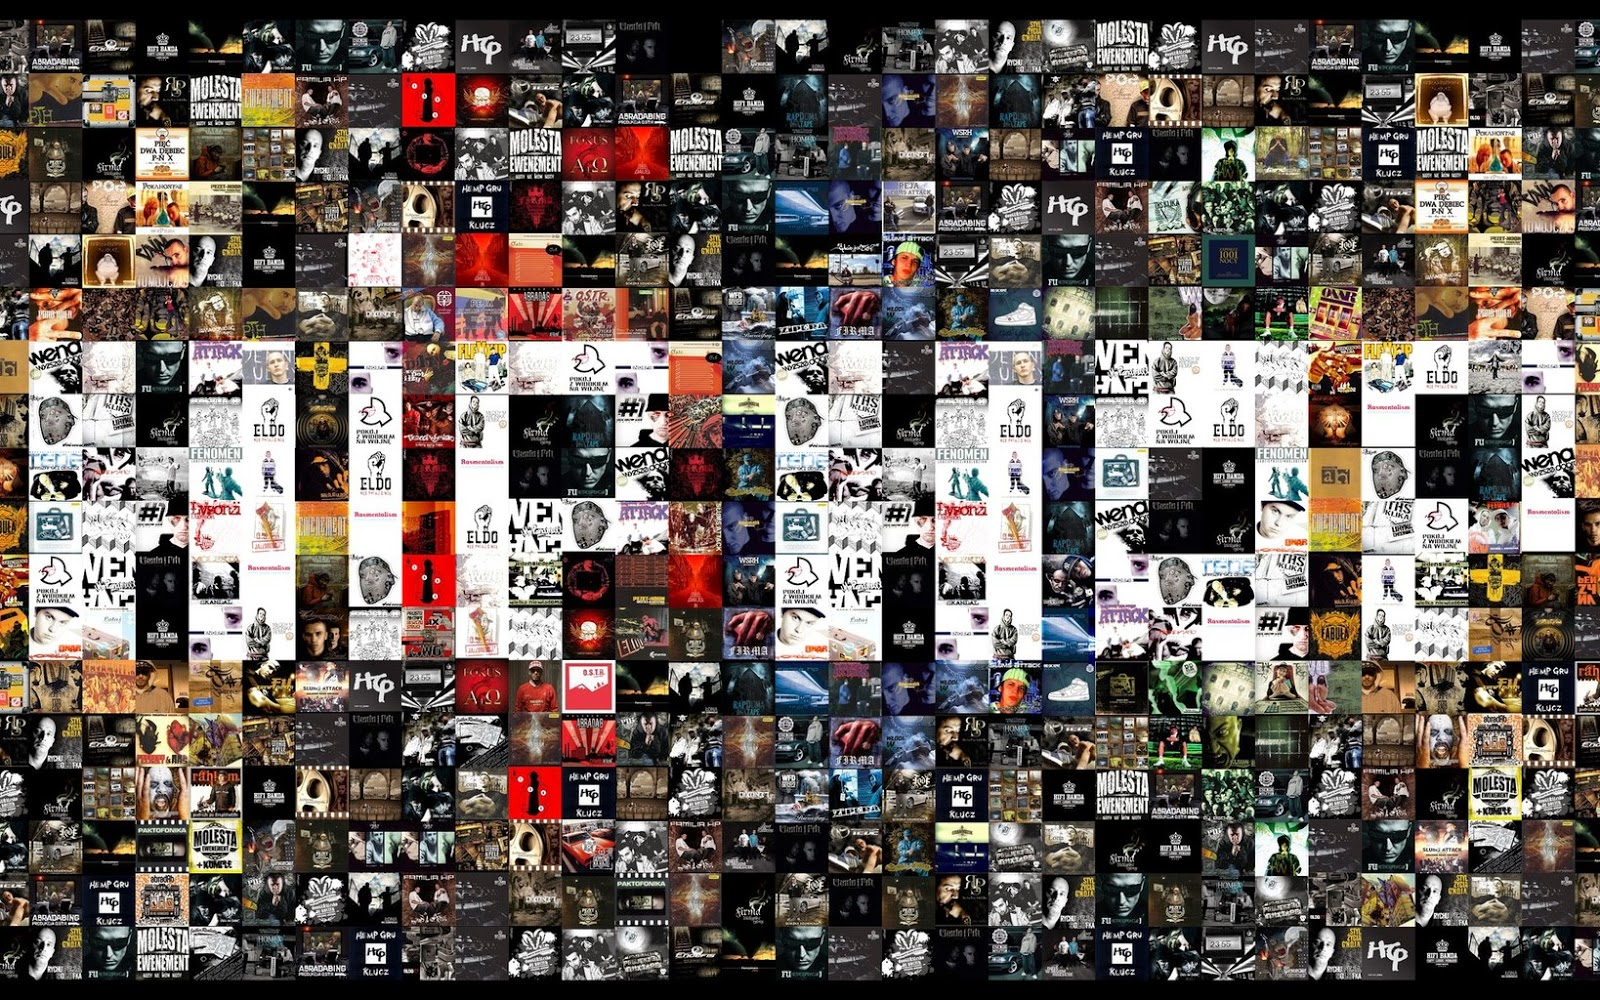 Download [Mp3]-[Hip Hop Hot Music] รวมเพลงฮิบฮอบทั้งเพลงไทยและเพลงสากล HIP HOP THAI & INTER มากกว่า 600 เพลง [Solidfiles] 4shared By Pleng-mun.com